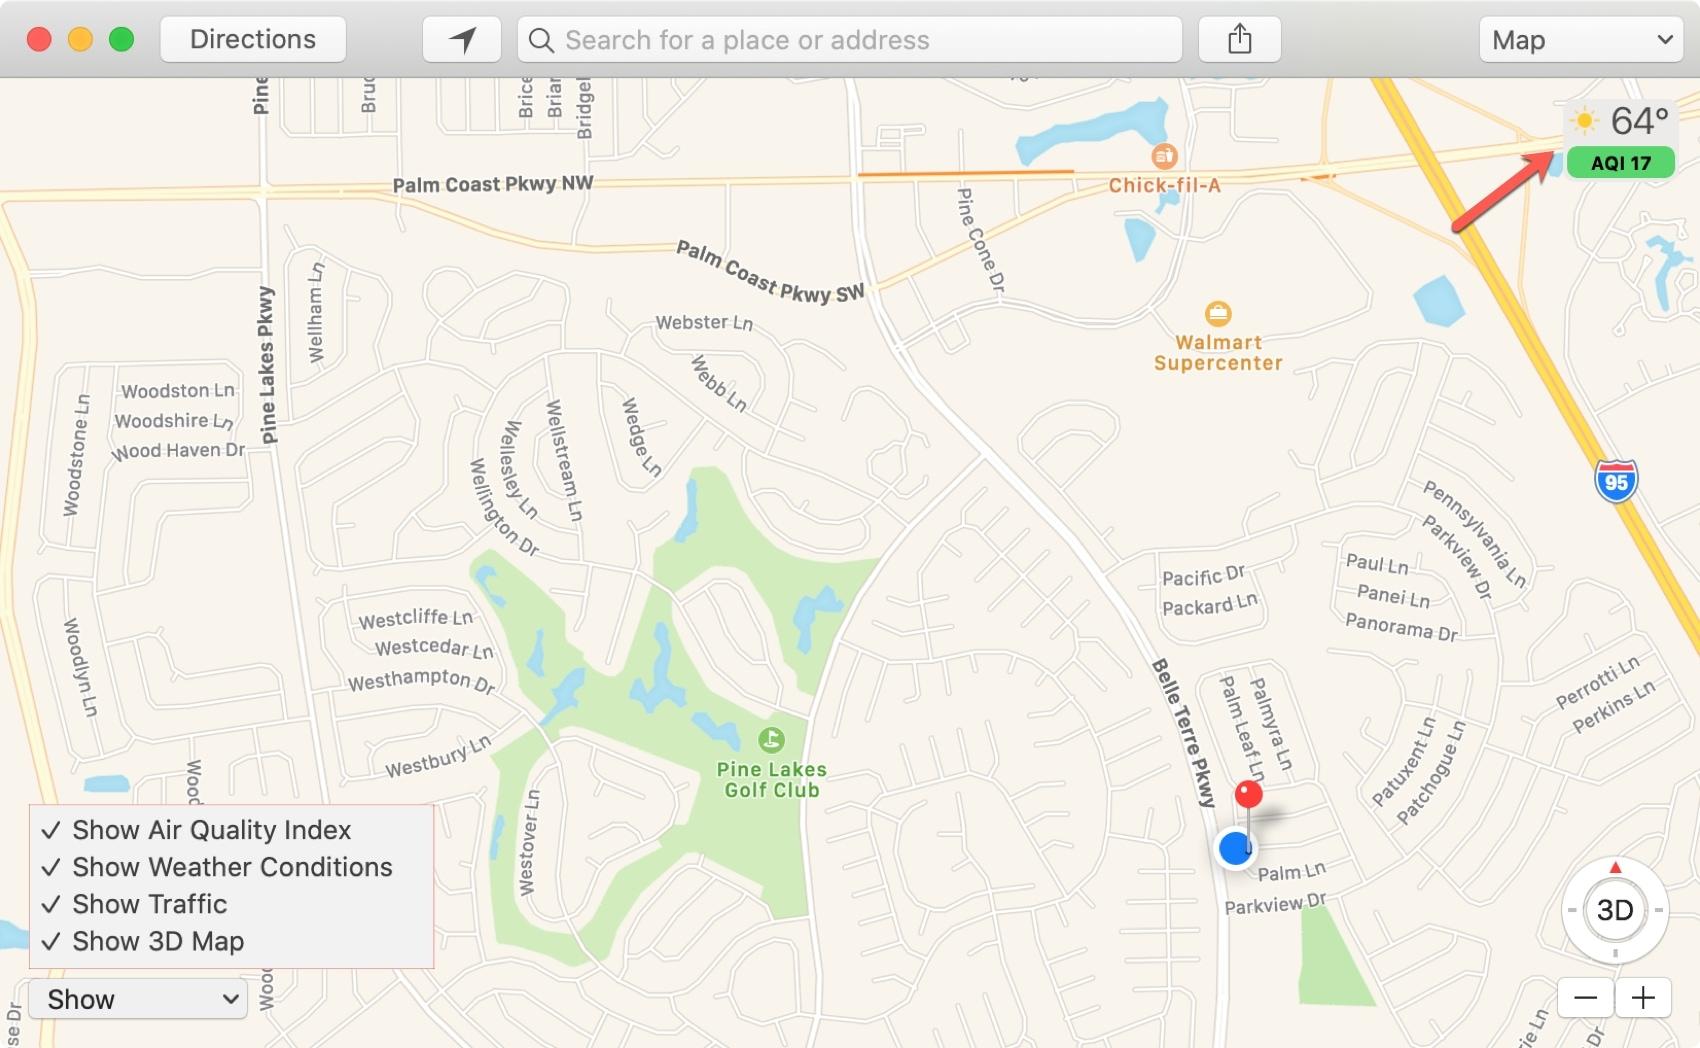 Map Show Options on Mac